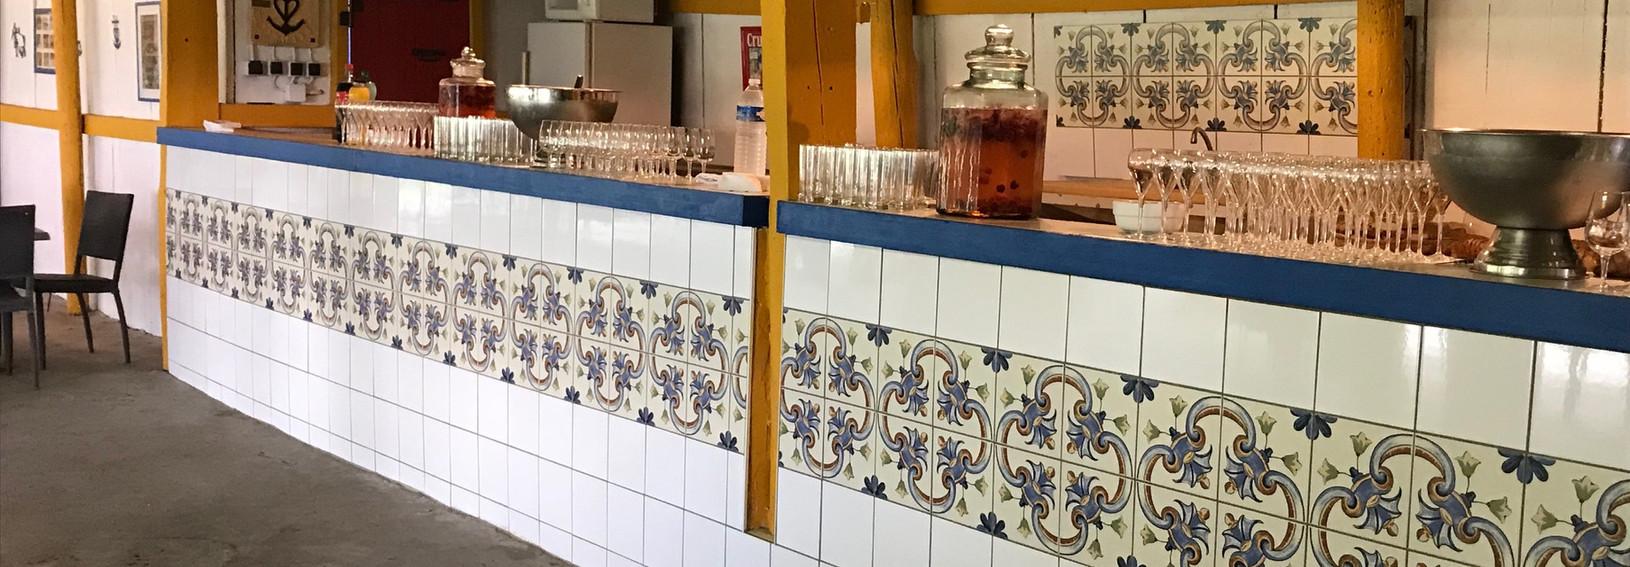 Bar sous la salle Loupio